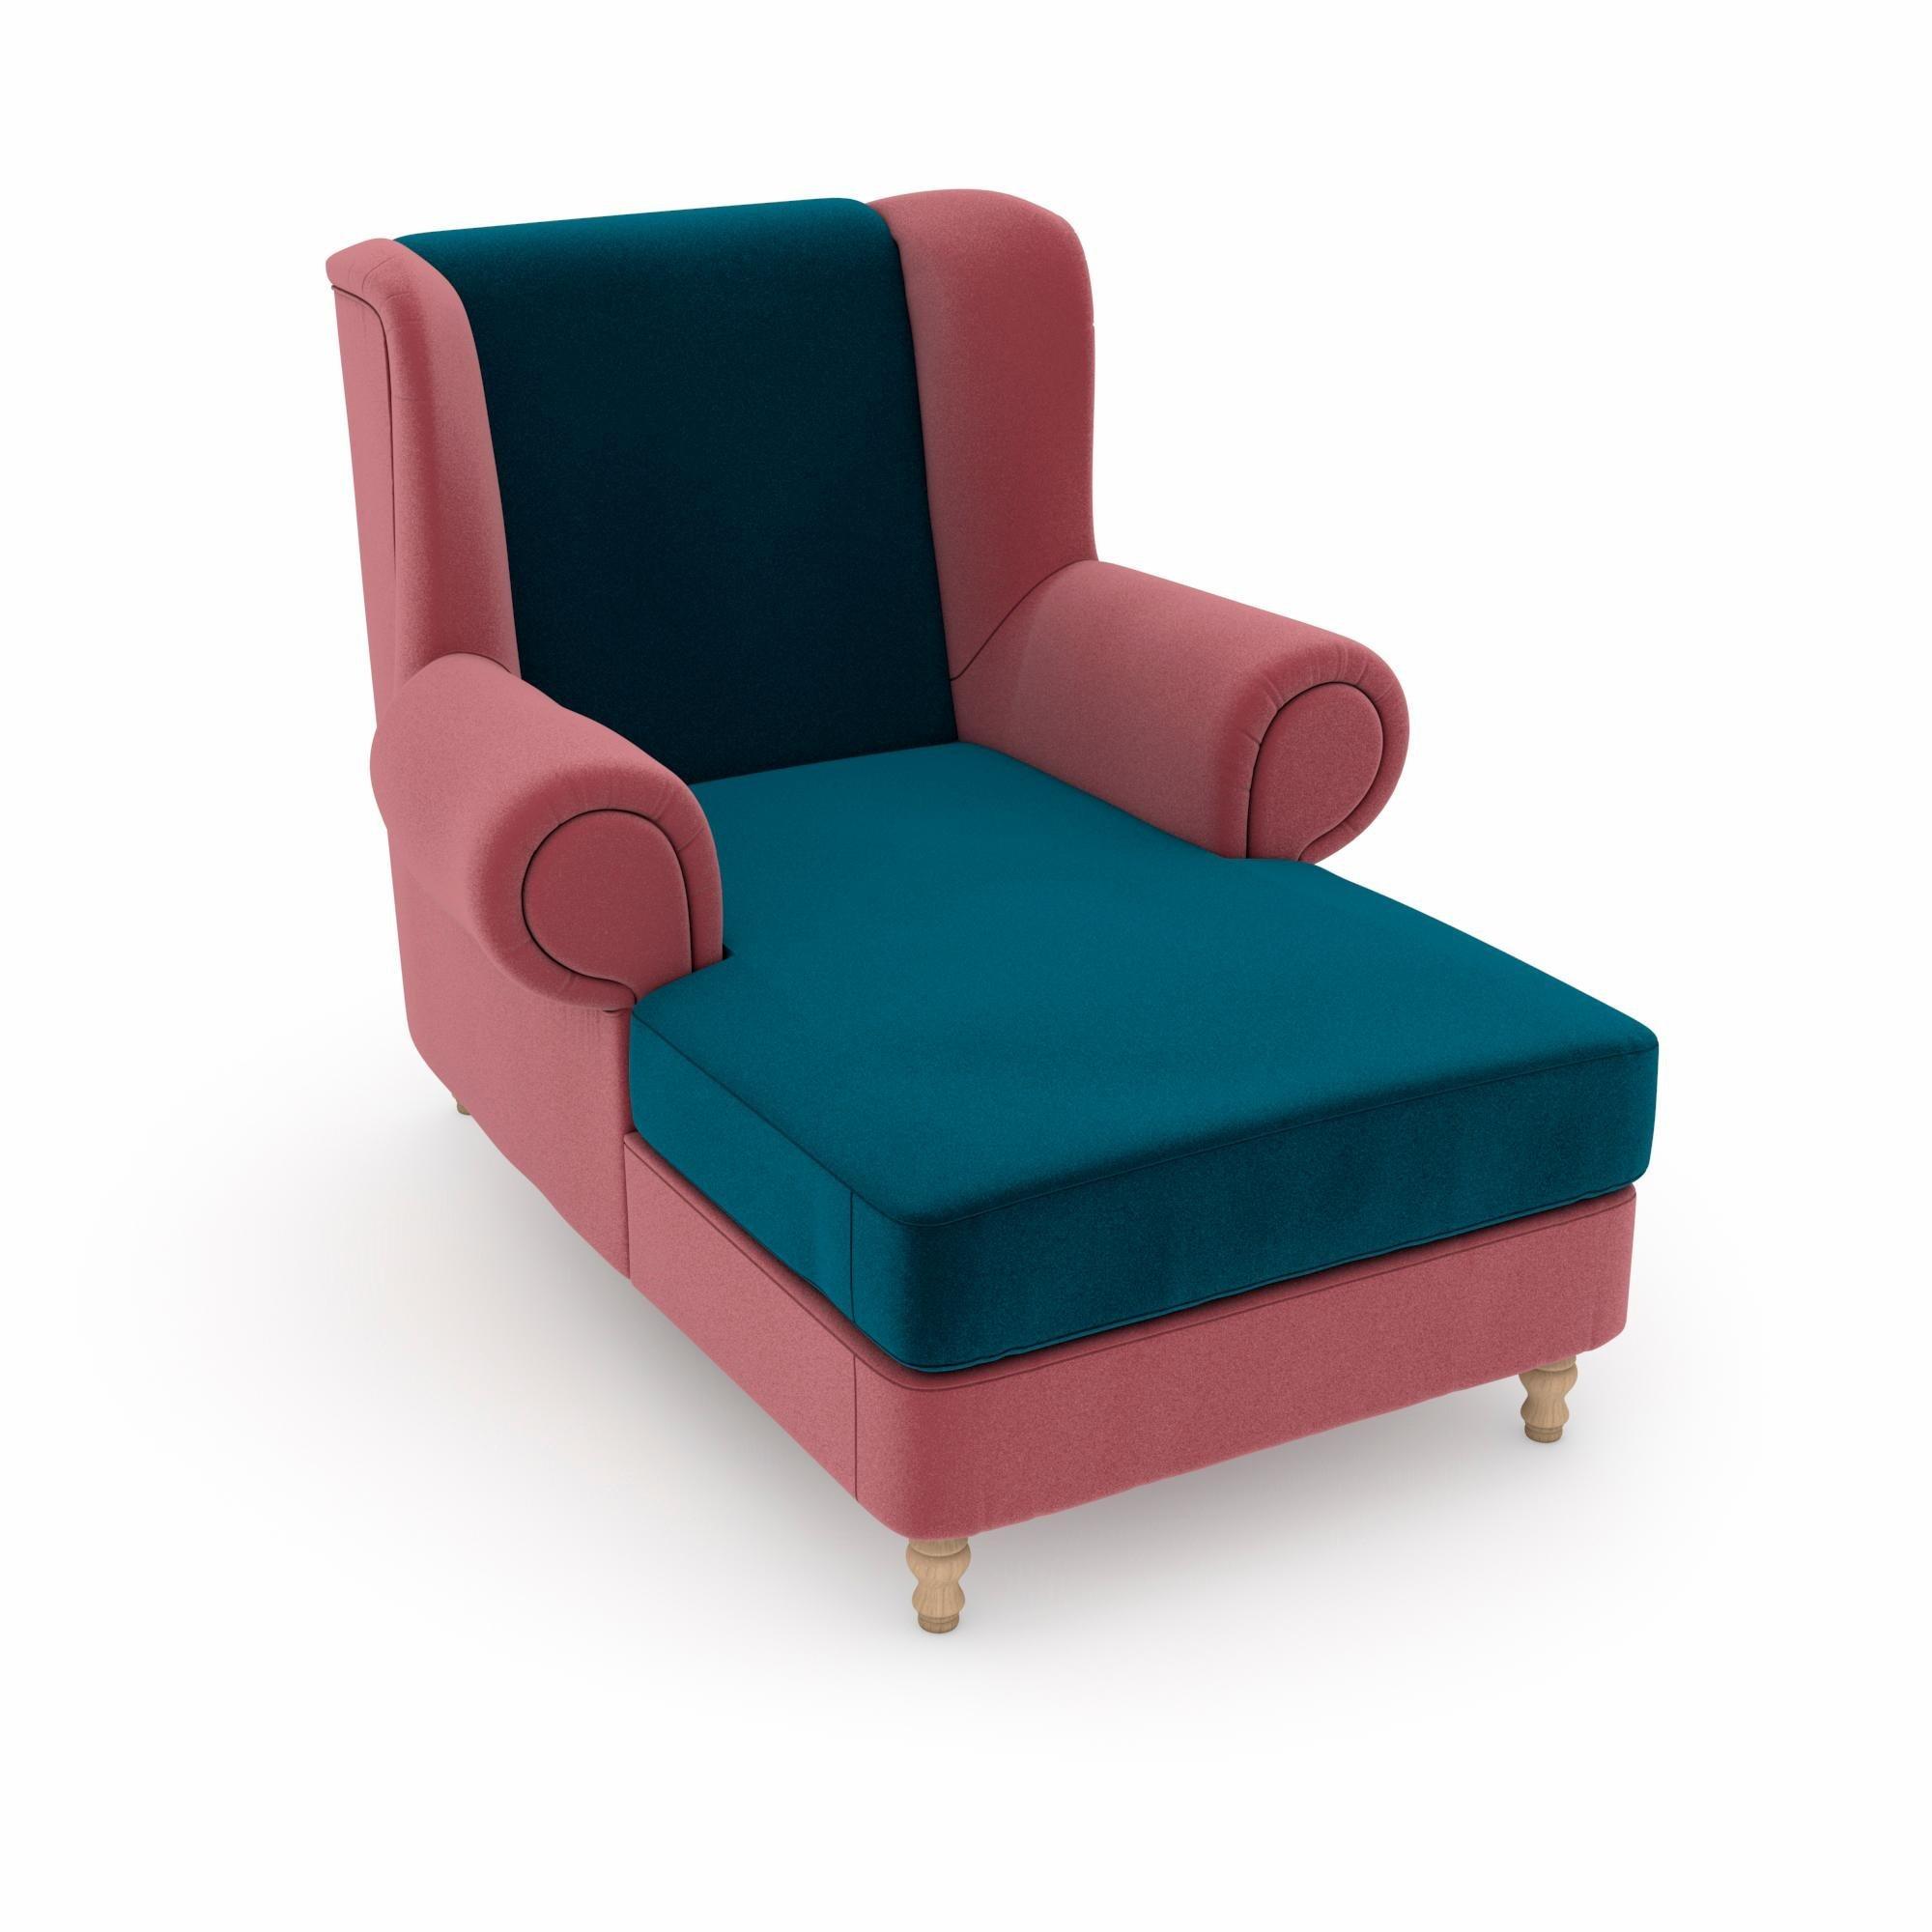 gold ohrensessel online kaufen m bel suchmaschine. Black Bedroom Furniture Sets. Home Design Ideas